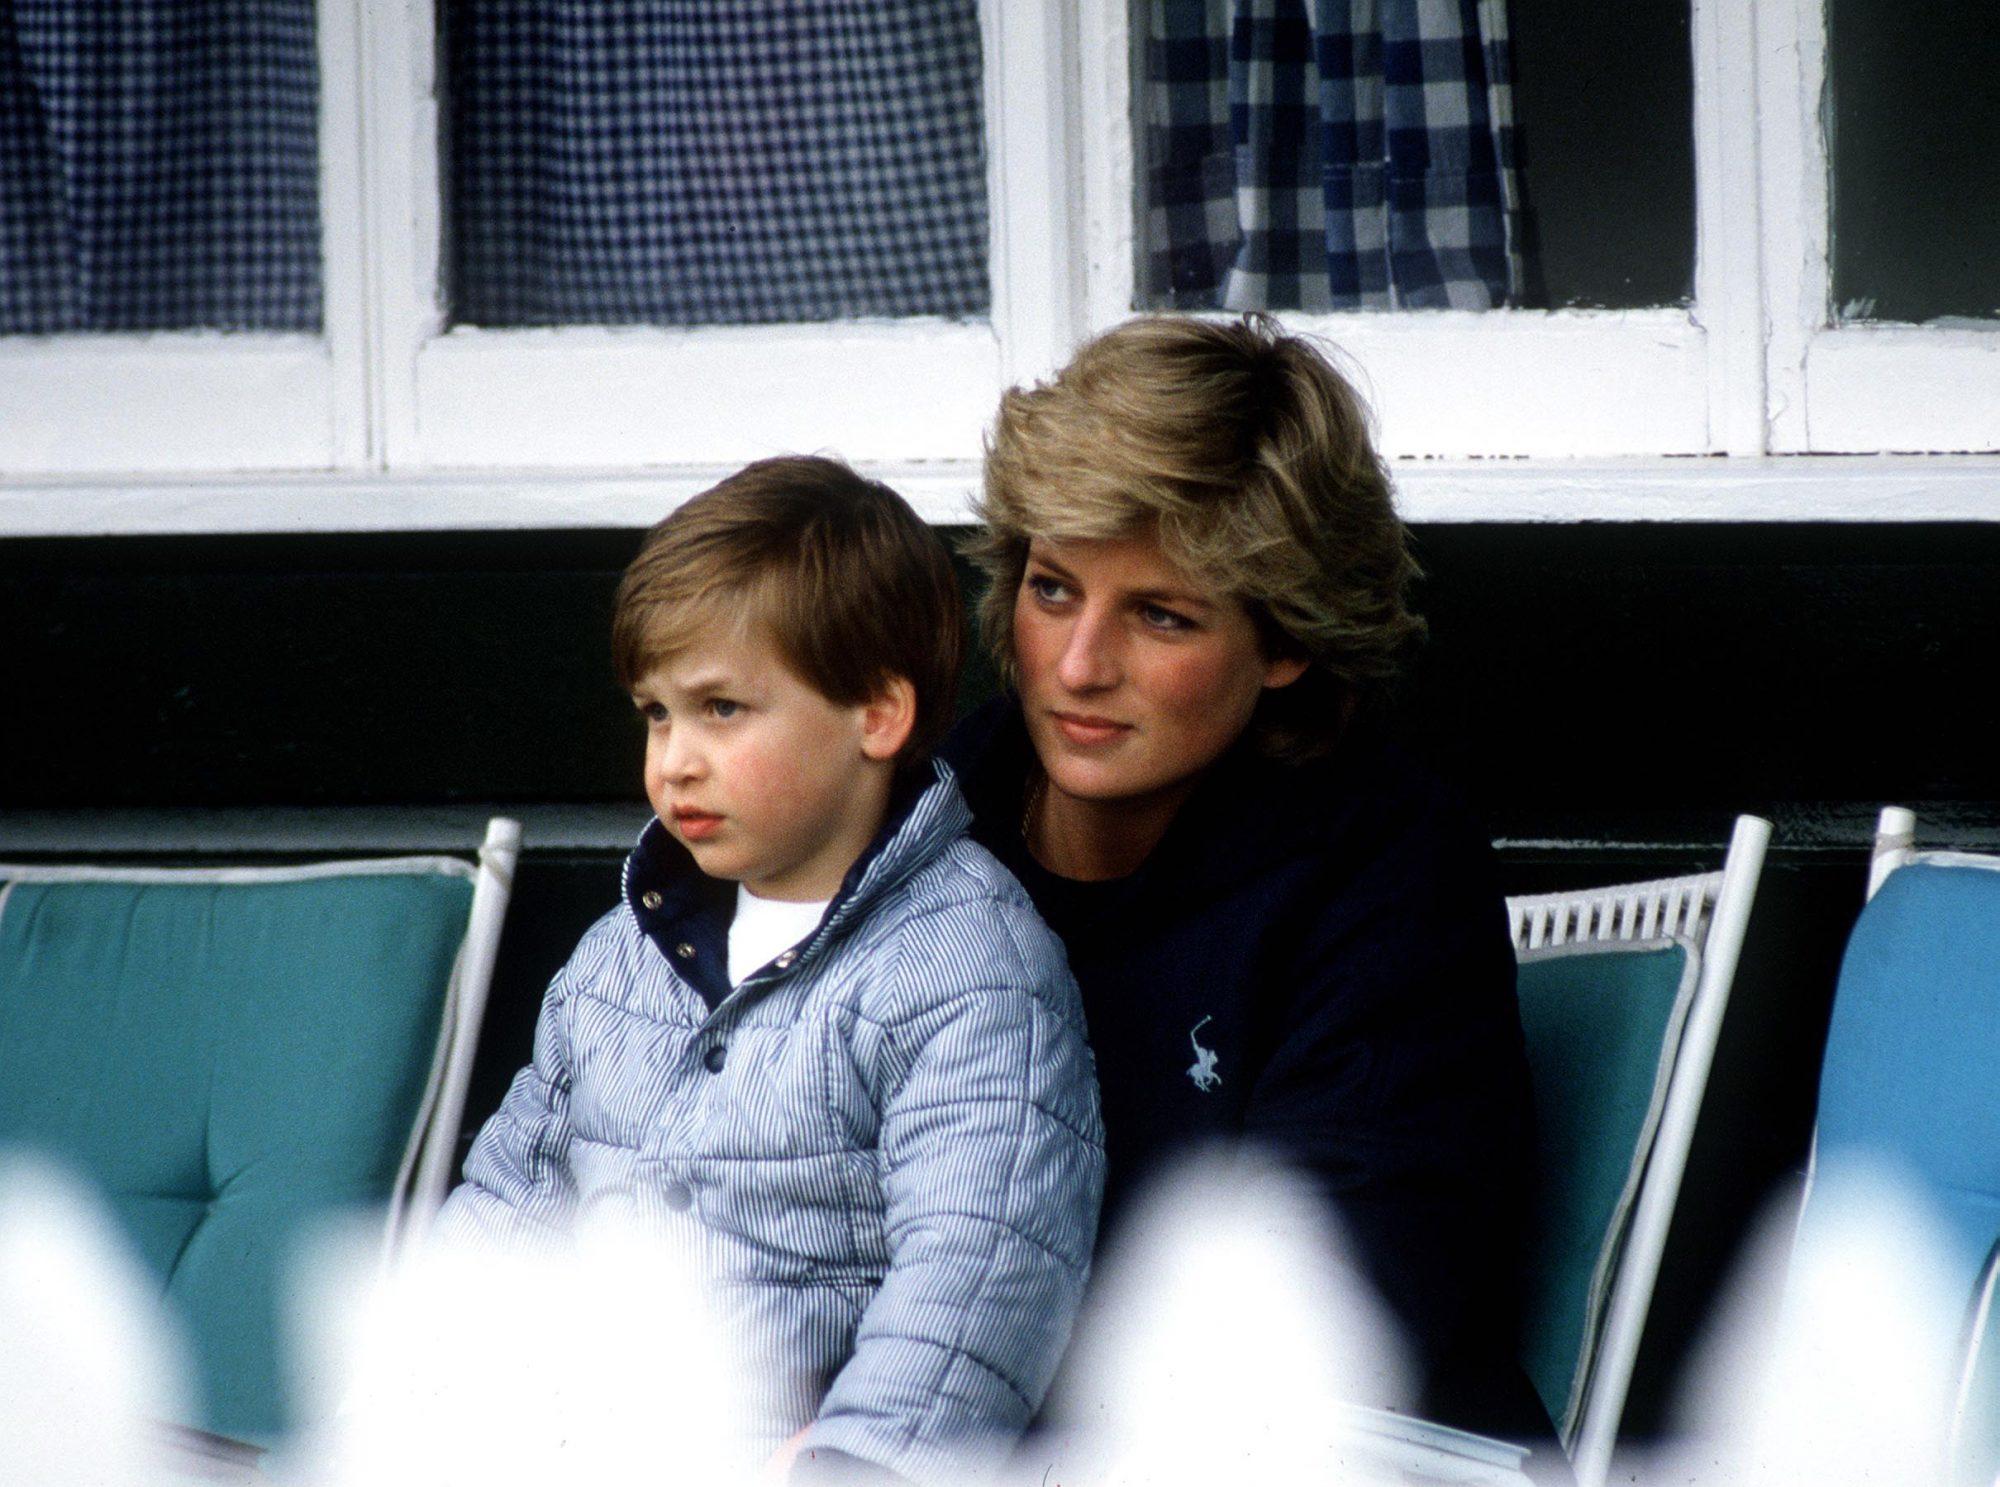 Princesa Diana, Principe WIlliam